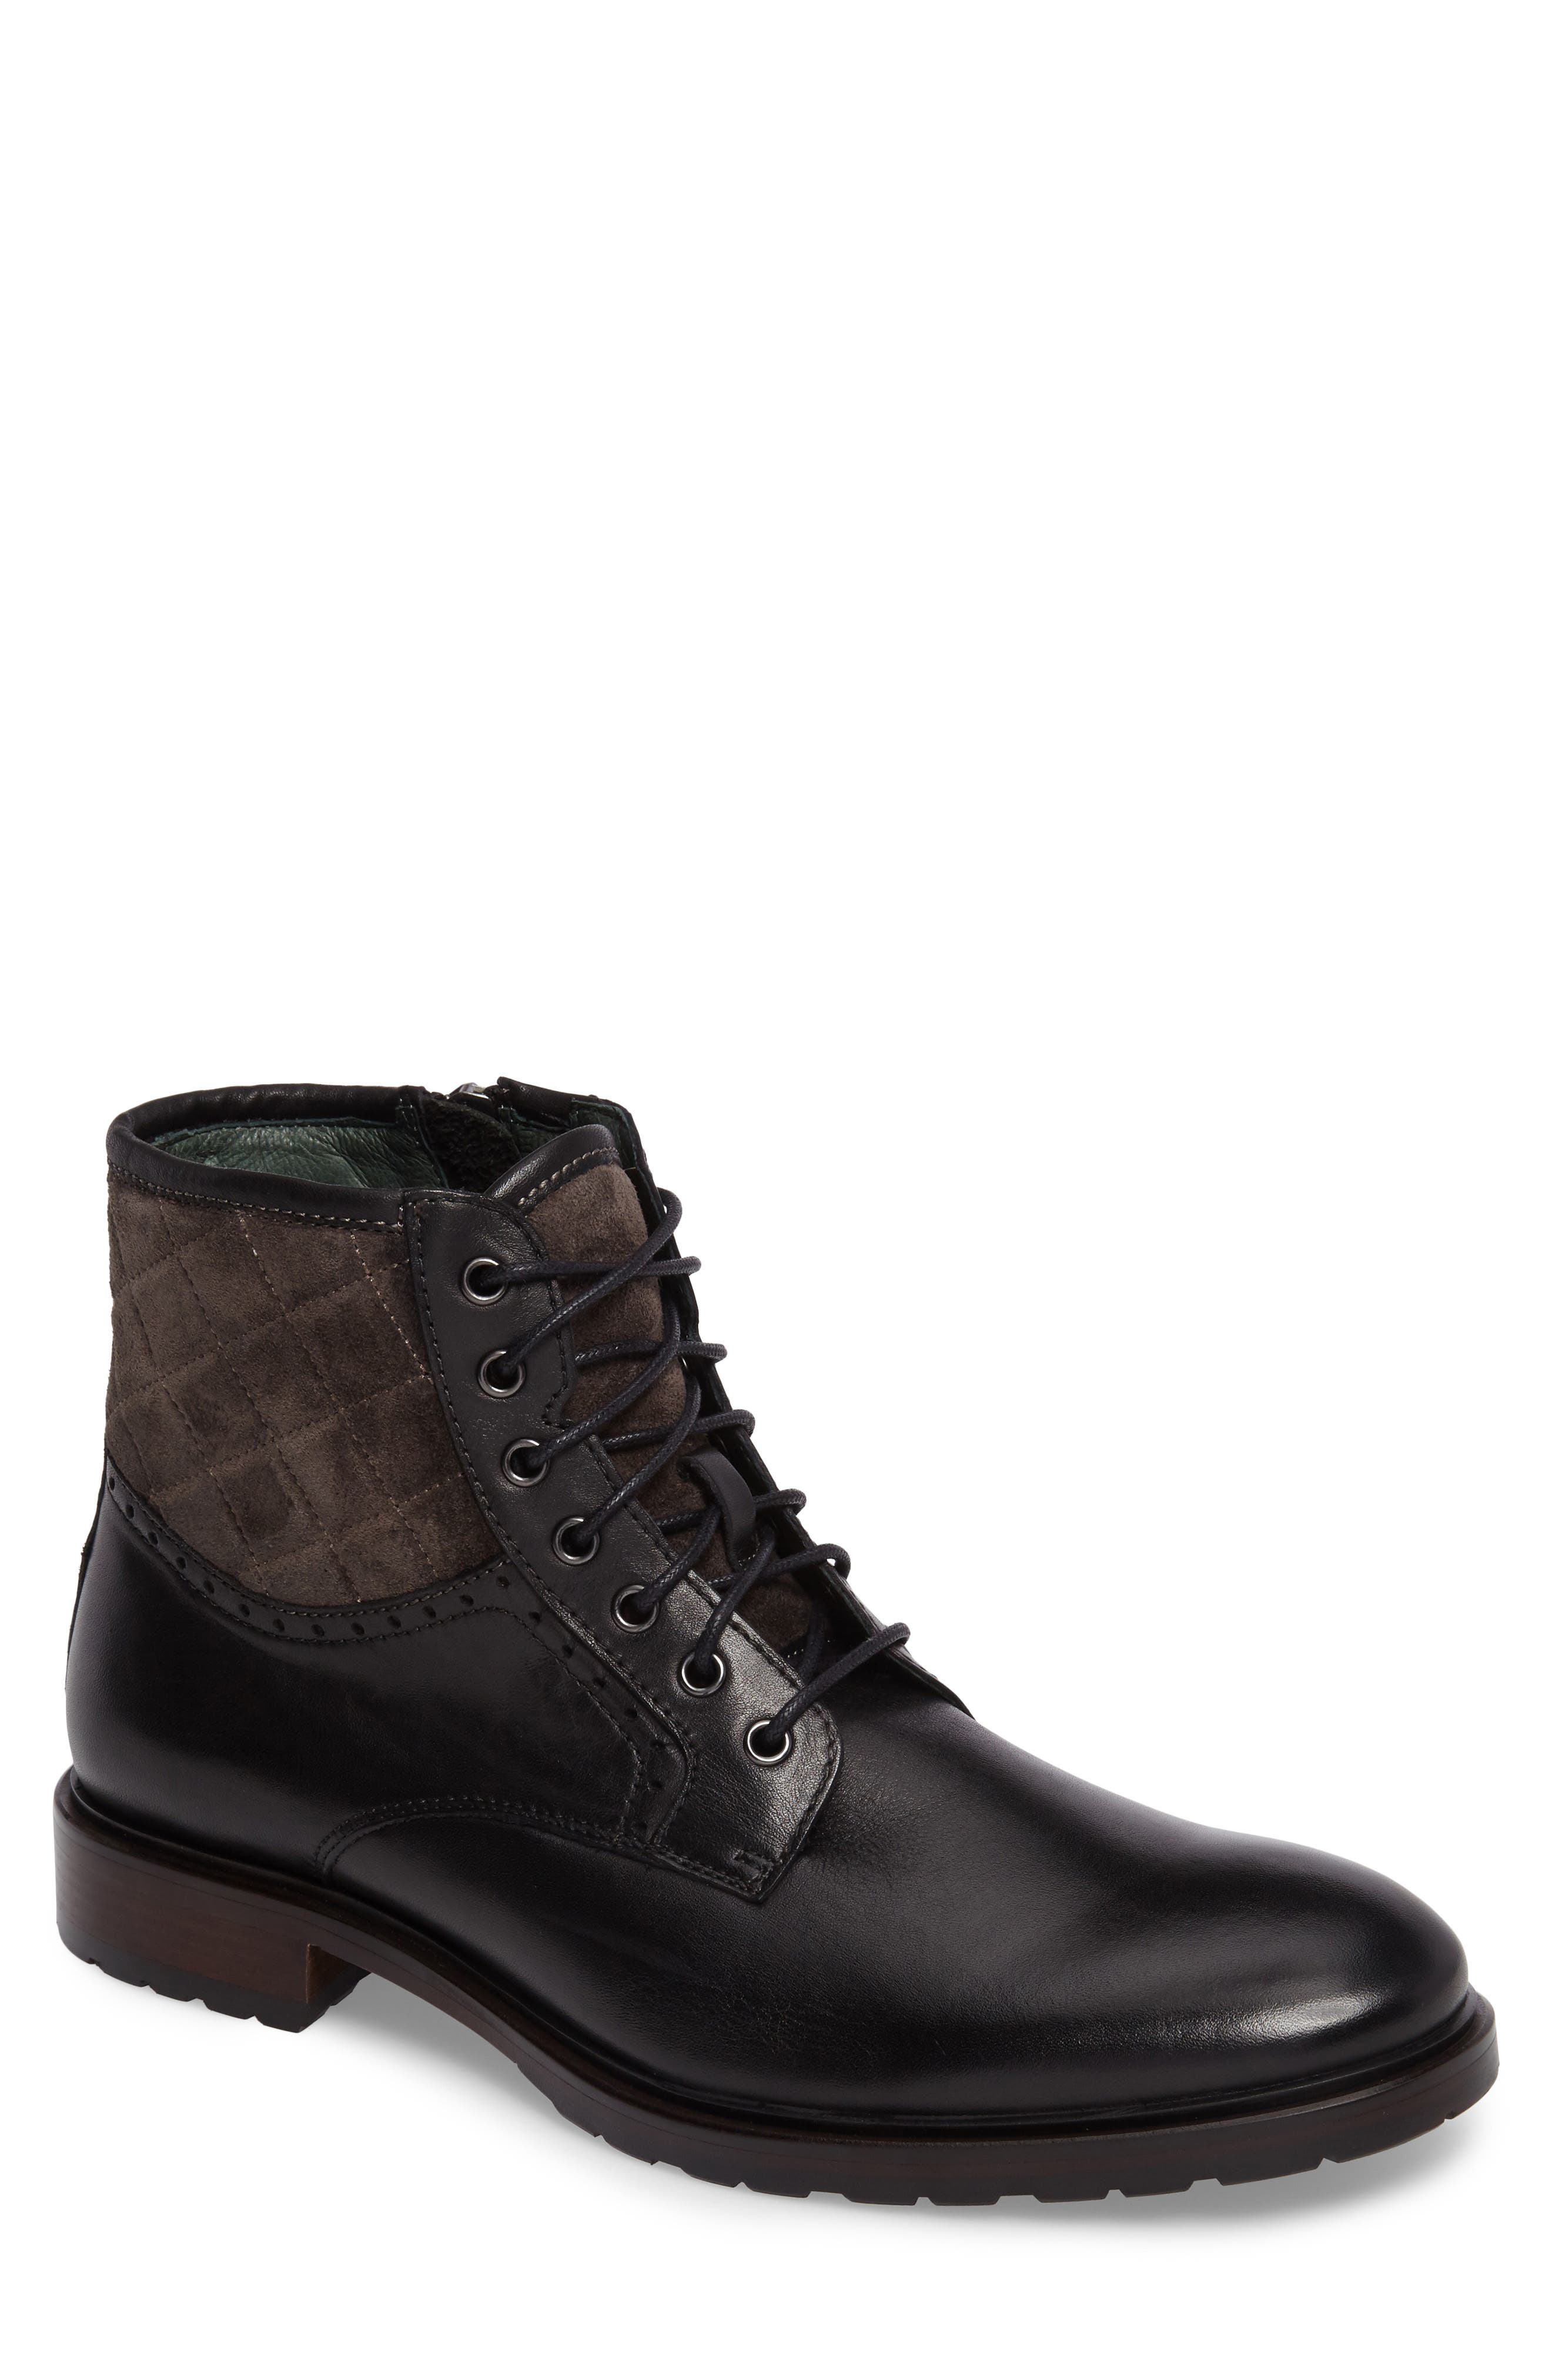 Myles Plain Toe Boot,                         Main,                         color, Black Leather